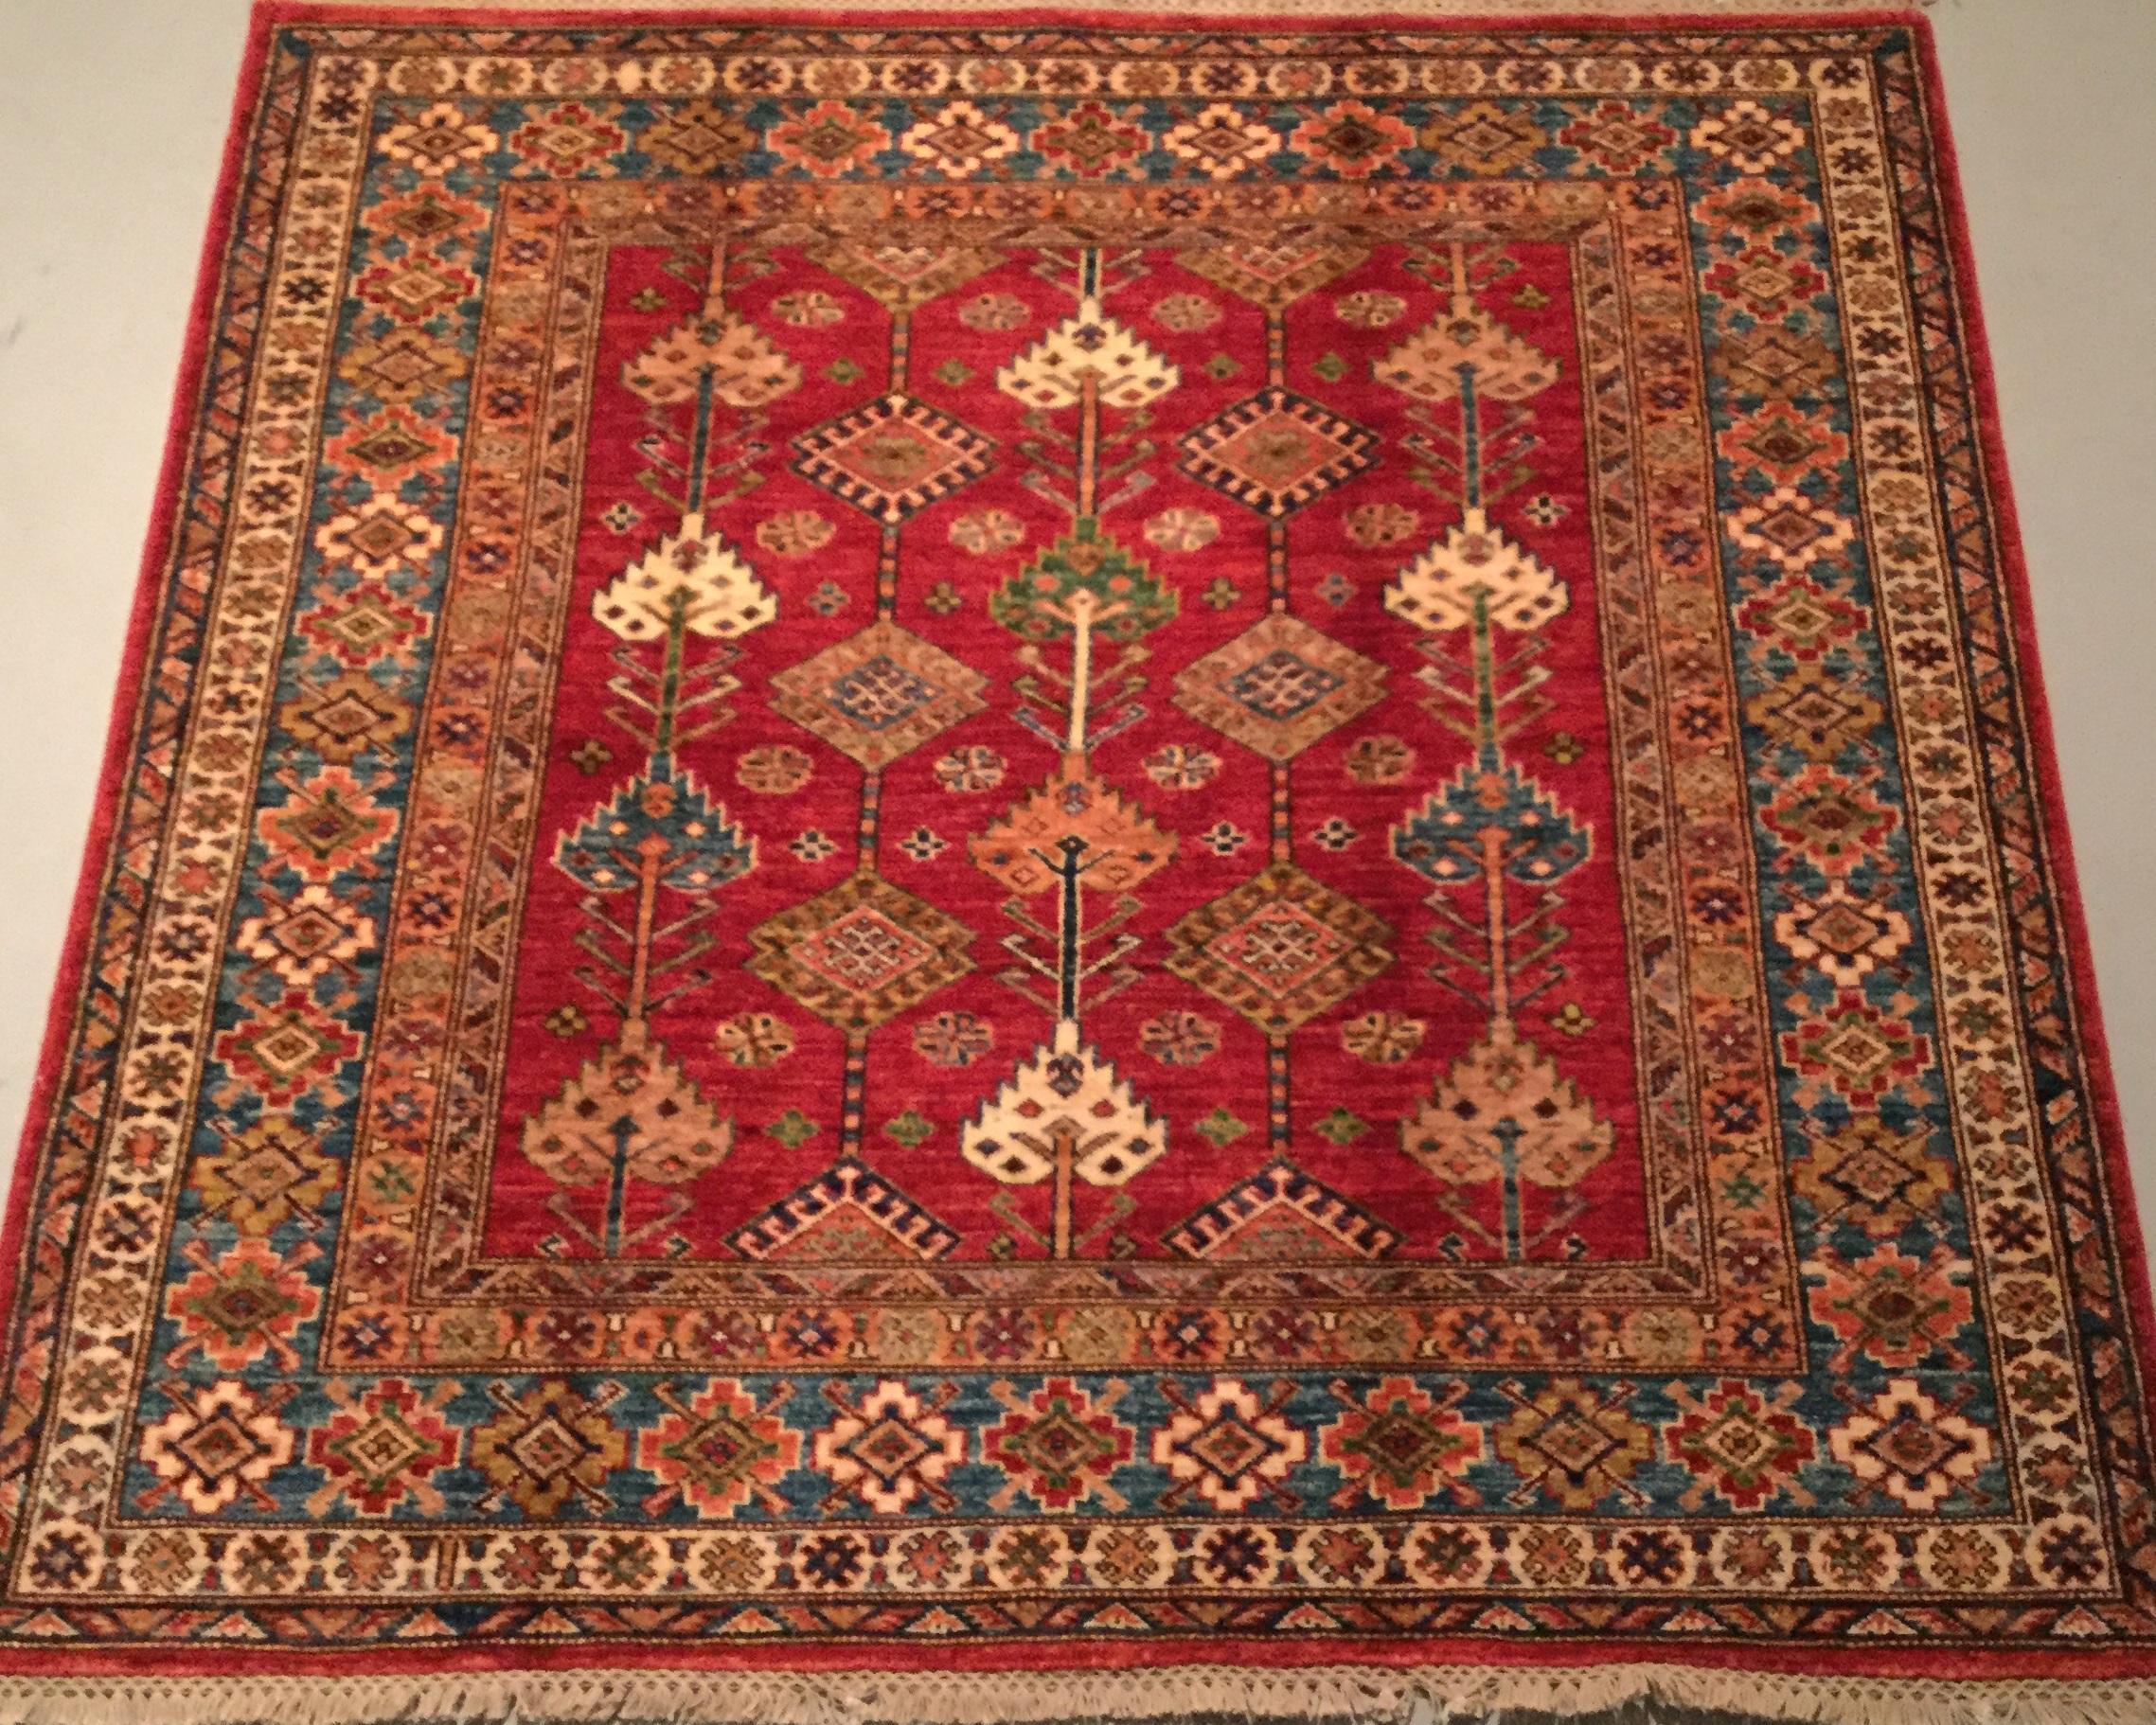 Afghan Kazak - Circa 2000'sSize Measurements: 148cm x 149cm